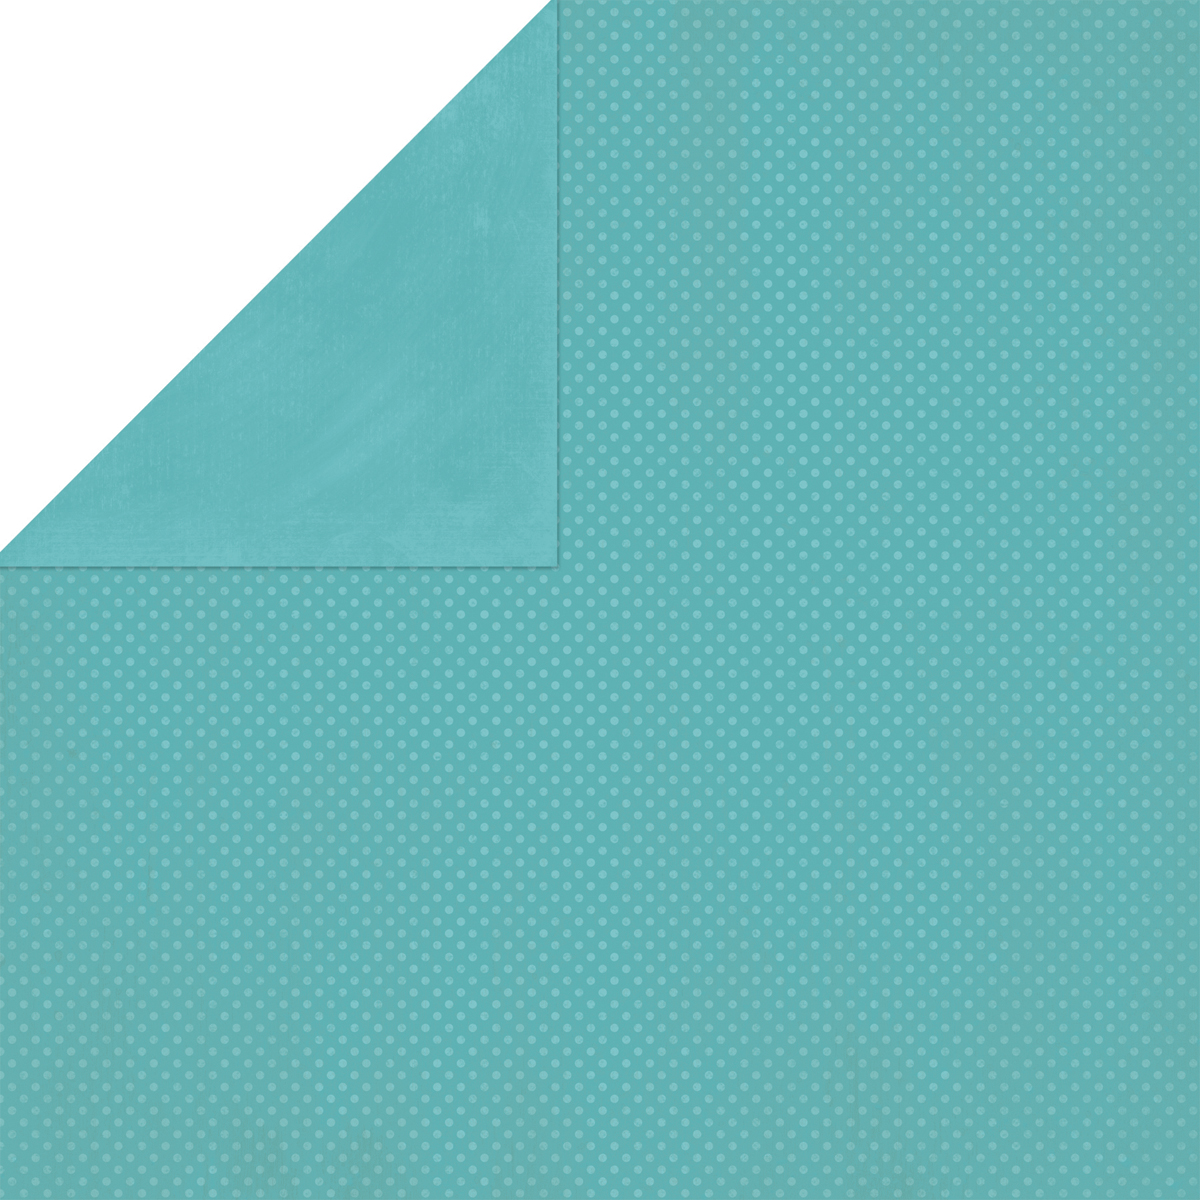 BoBunny Double Dot Double-Sided Textured Cardstock 12X12-Aquamarine